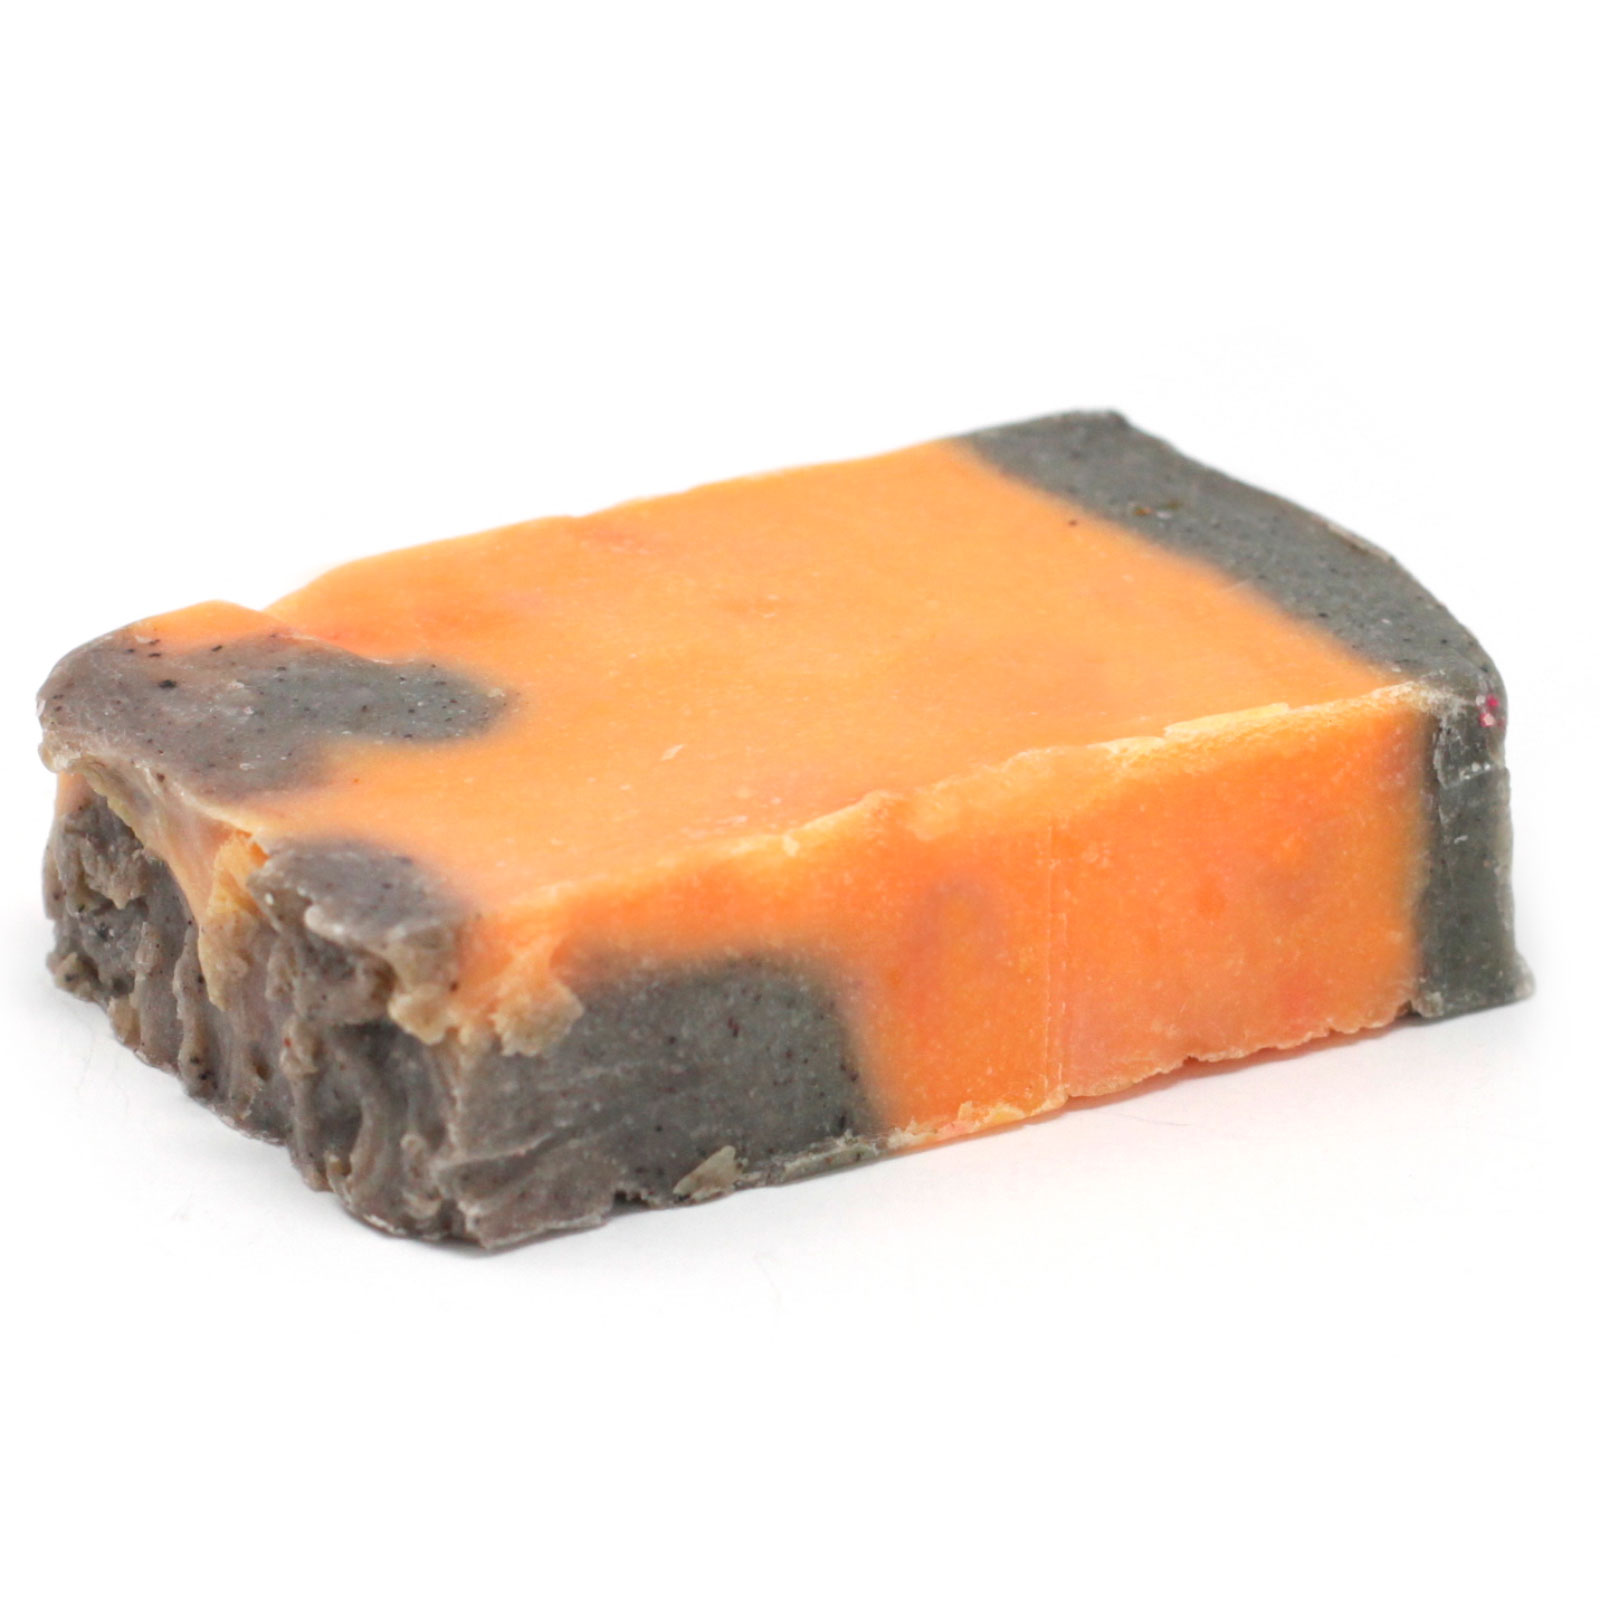 Cinnamon and Orange Olive Oil Soap SLICE approx 100g